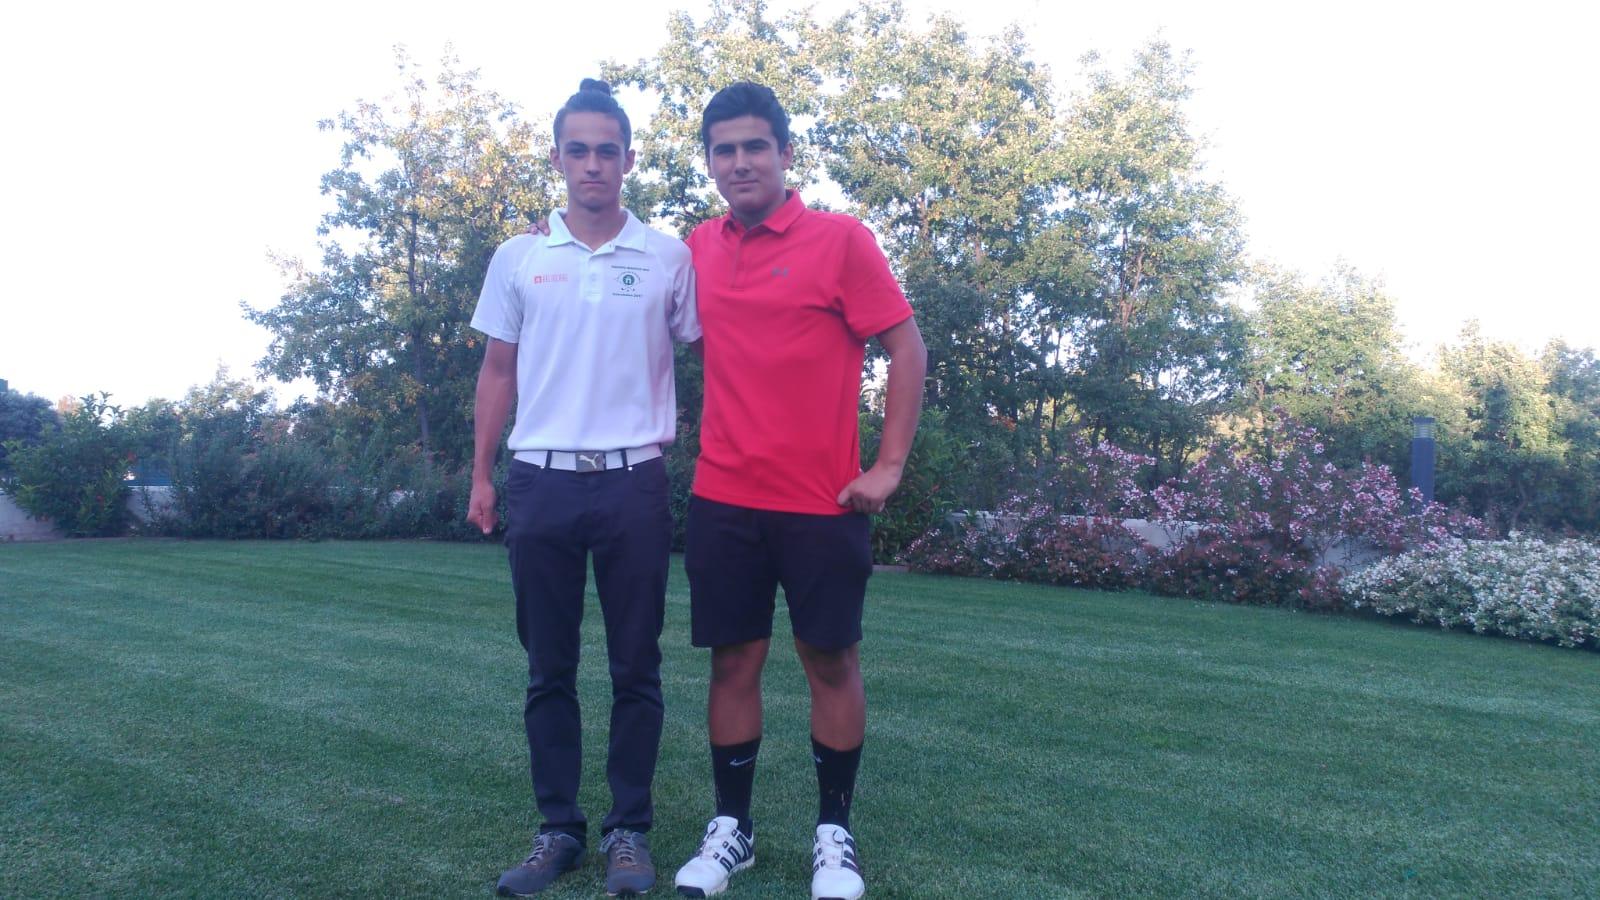 Campeonato de La Rioja Match-Play 2018